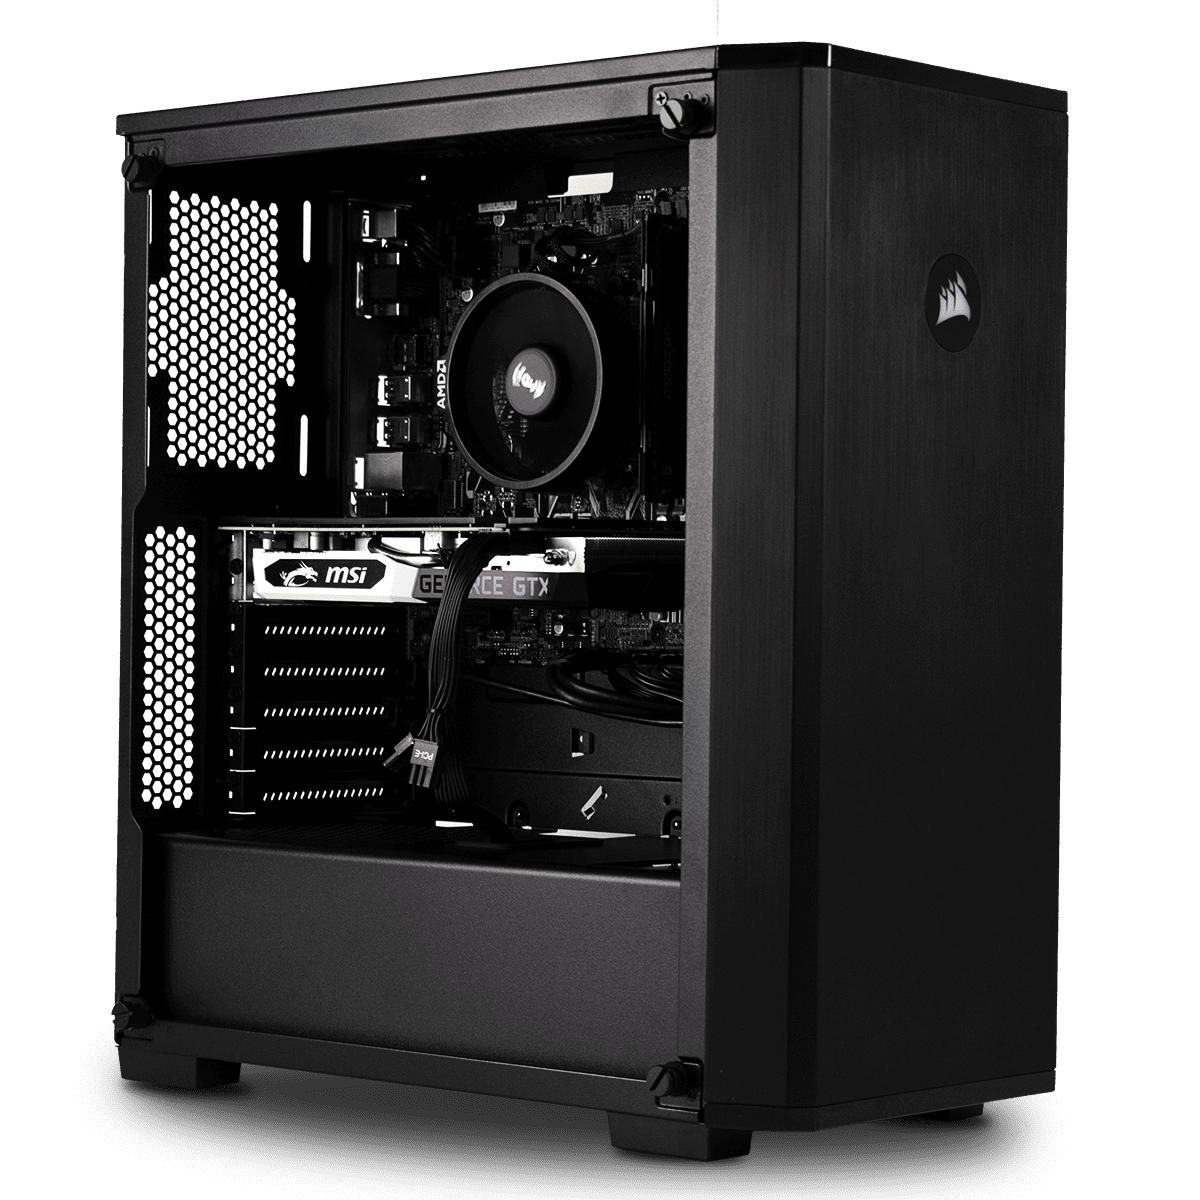 PC Cybertek Recon - Ryzen 5 3600, GTX 1660, 16Go Ram, SSD 480GO, DD 4TO, sans OS